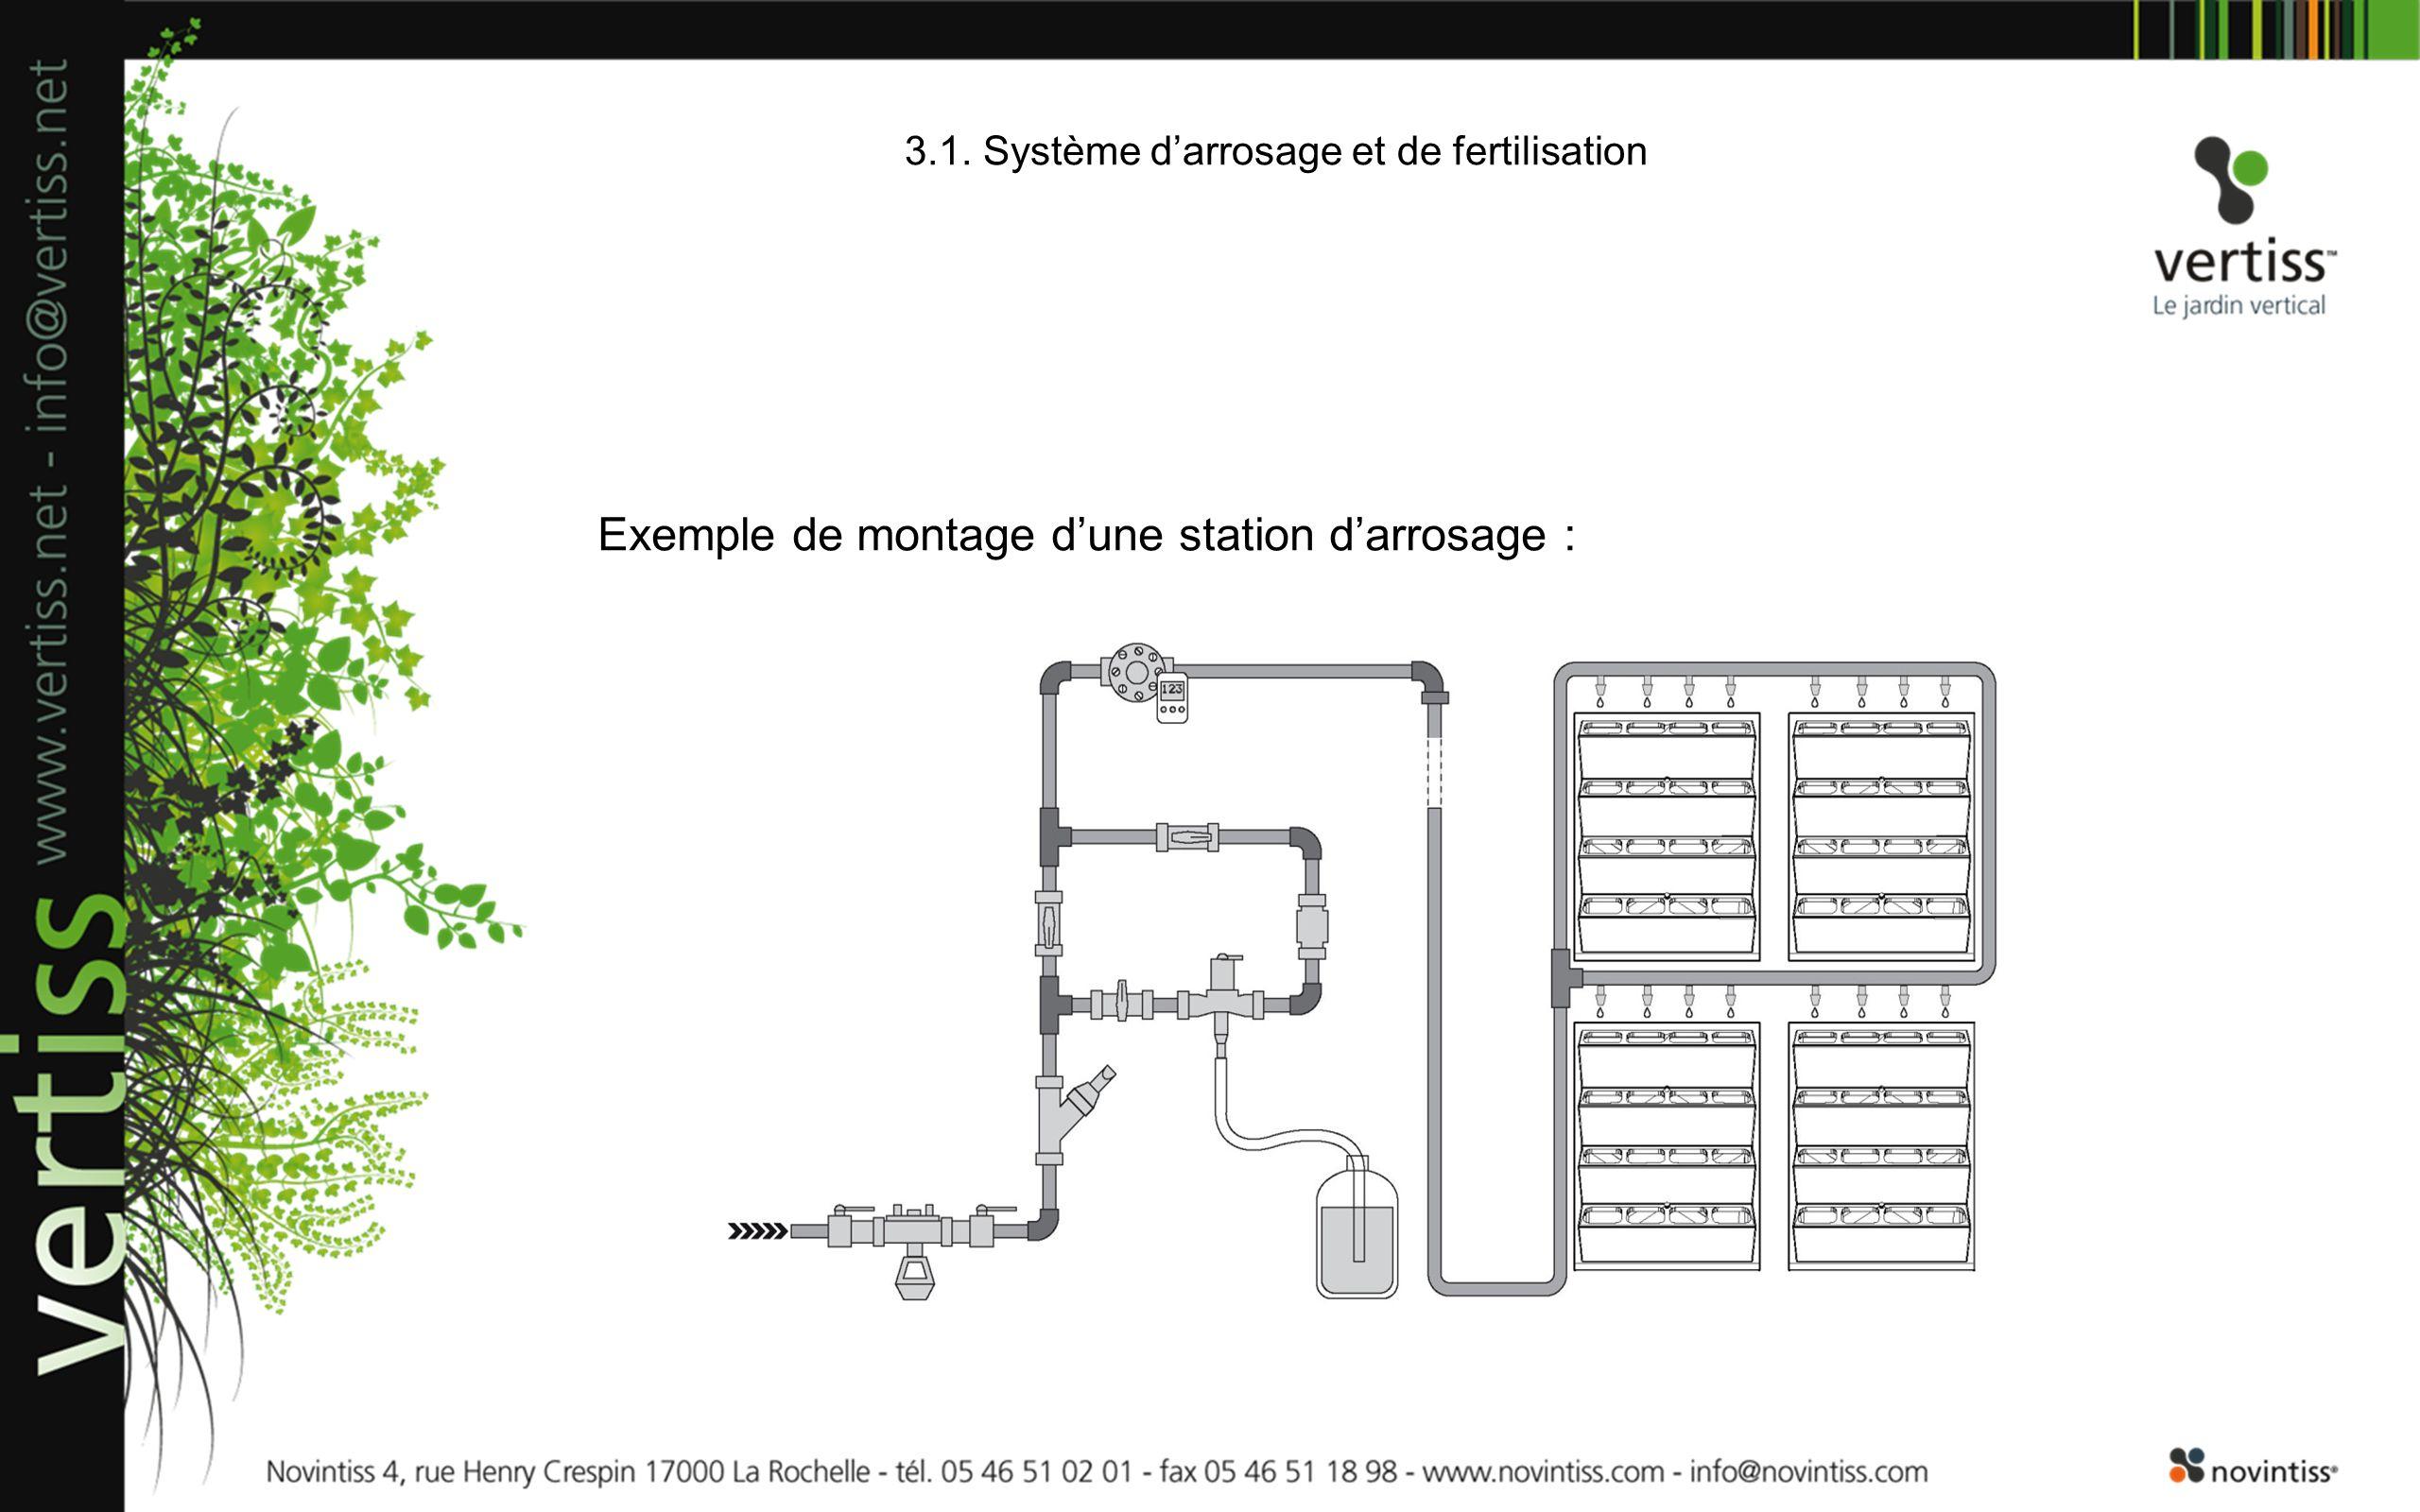 Exemple de montage dune station darrosage : 3.1. Système darrosage et de fertilisation